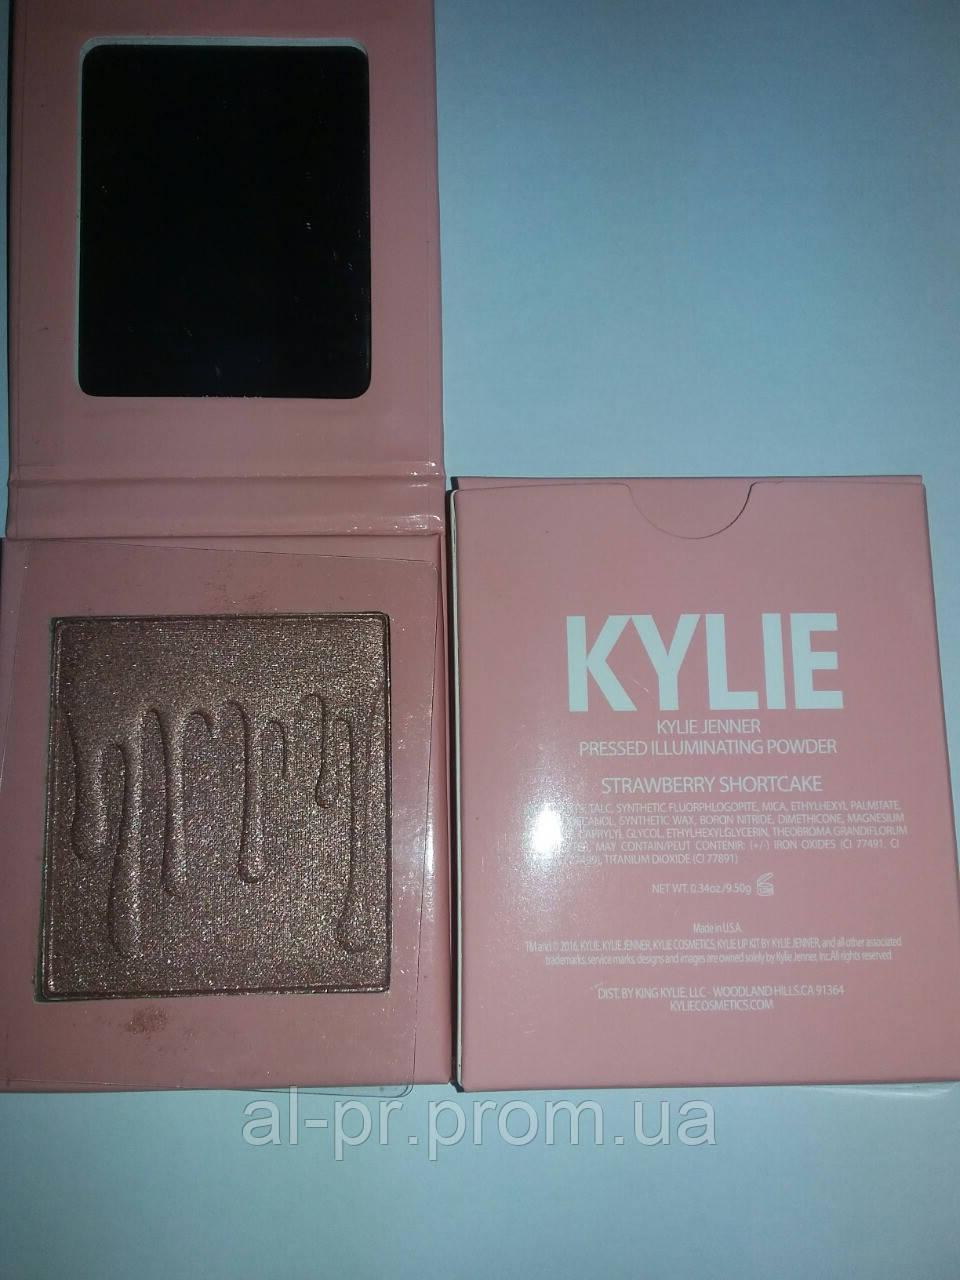 Хайлайтер для лица Kylie Jenner Pressed Illuminating Powder Strewberry Shortcake